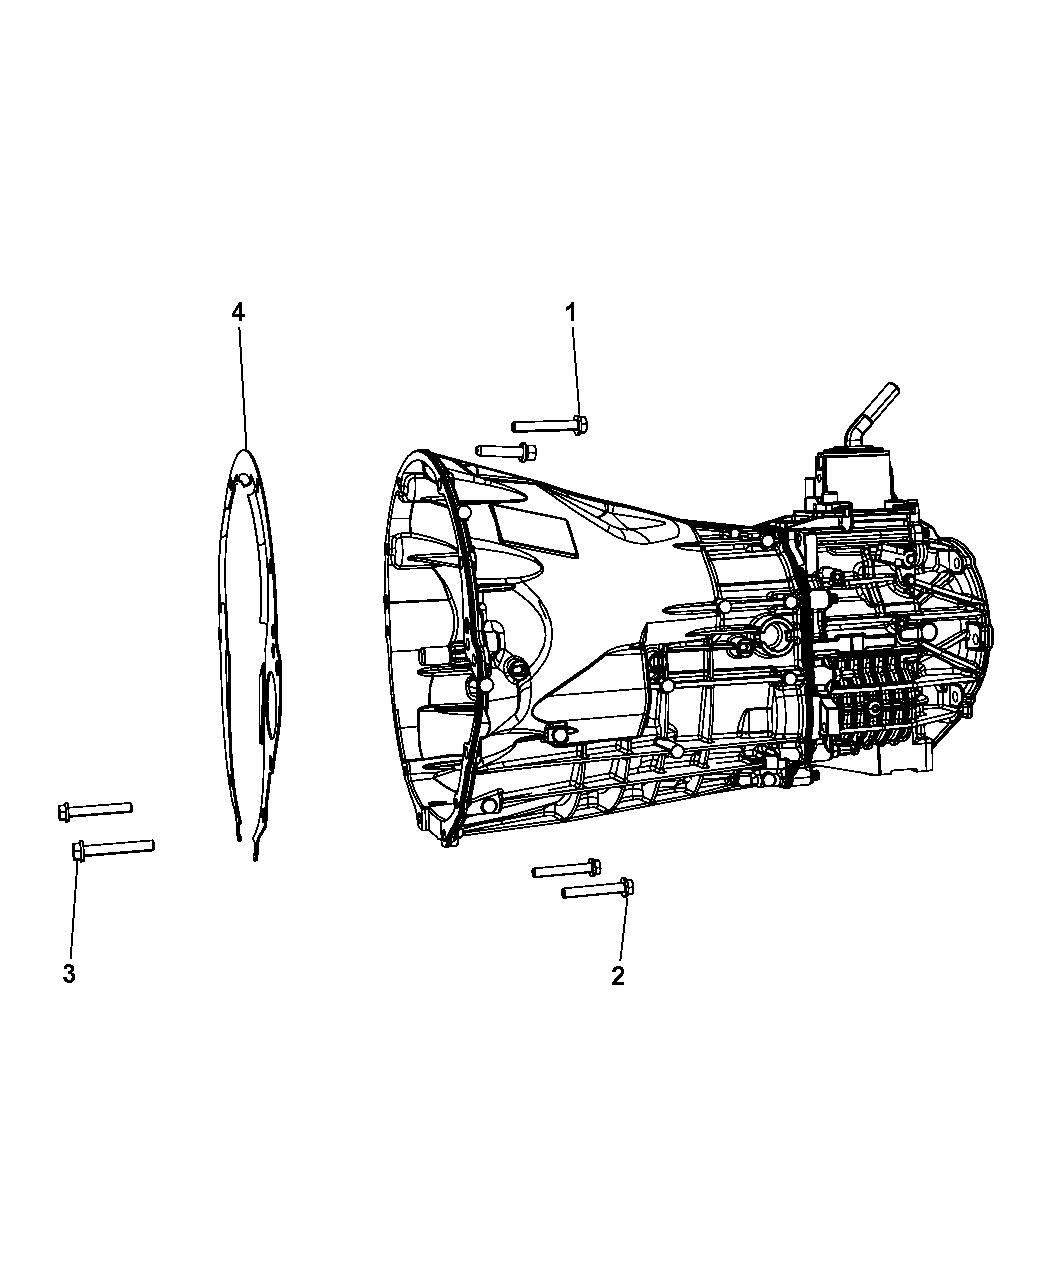 2008 Dodge Nitro Mounting Bolts Of Manual Transmission